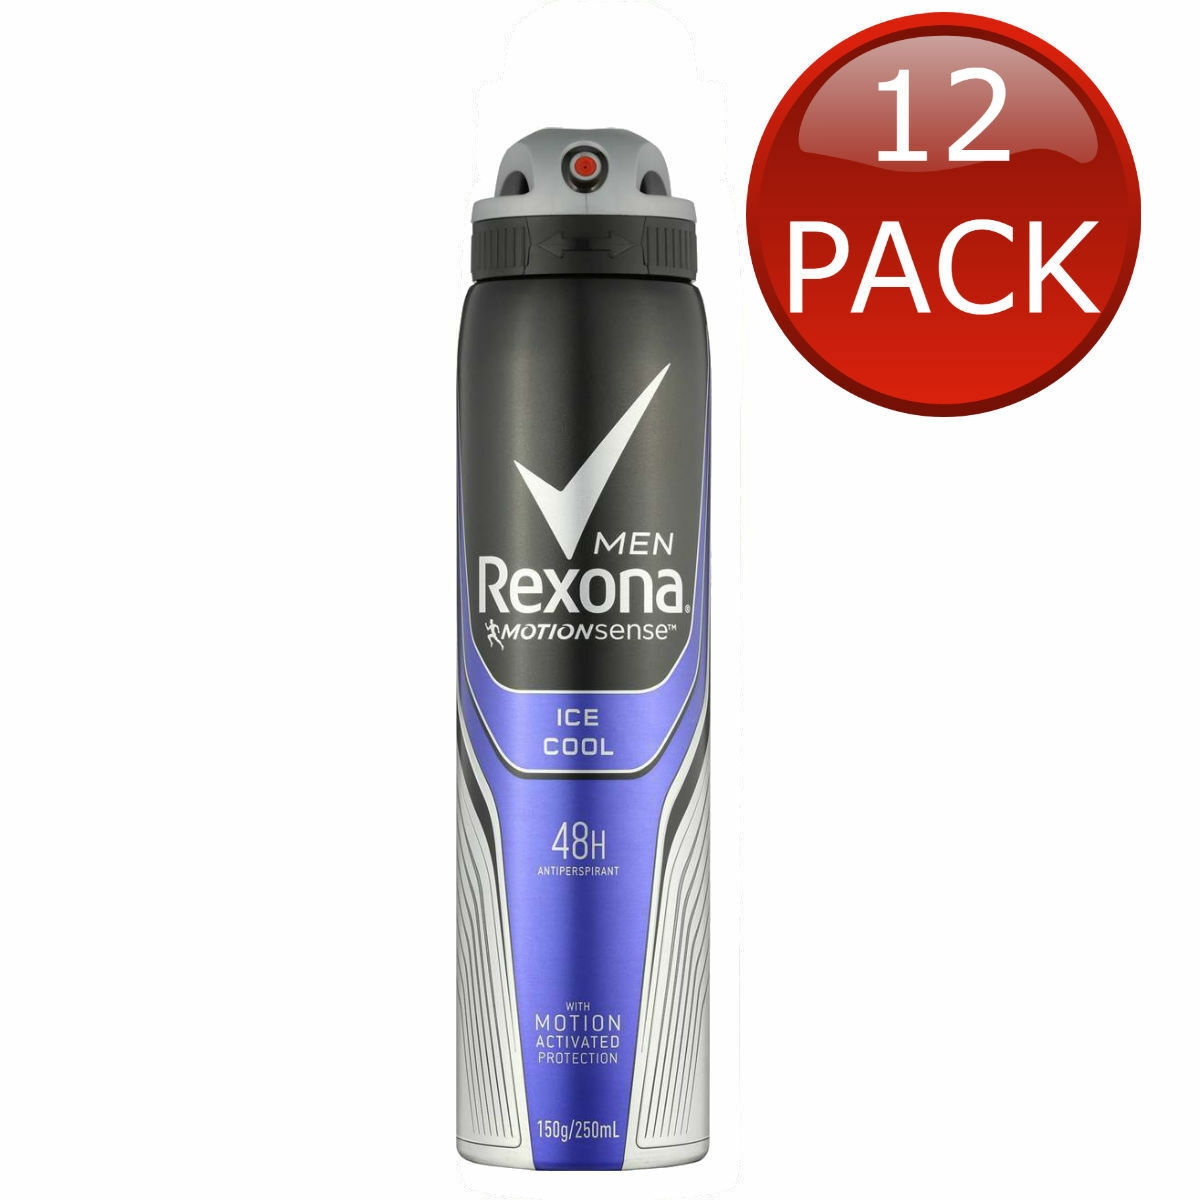 Rexona Men's Antiperspirant Deodorant